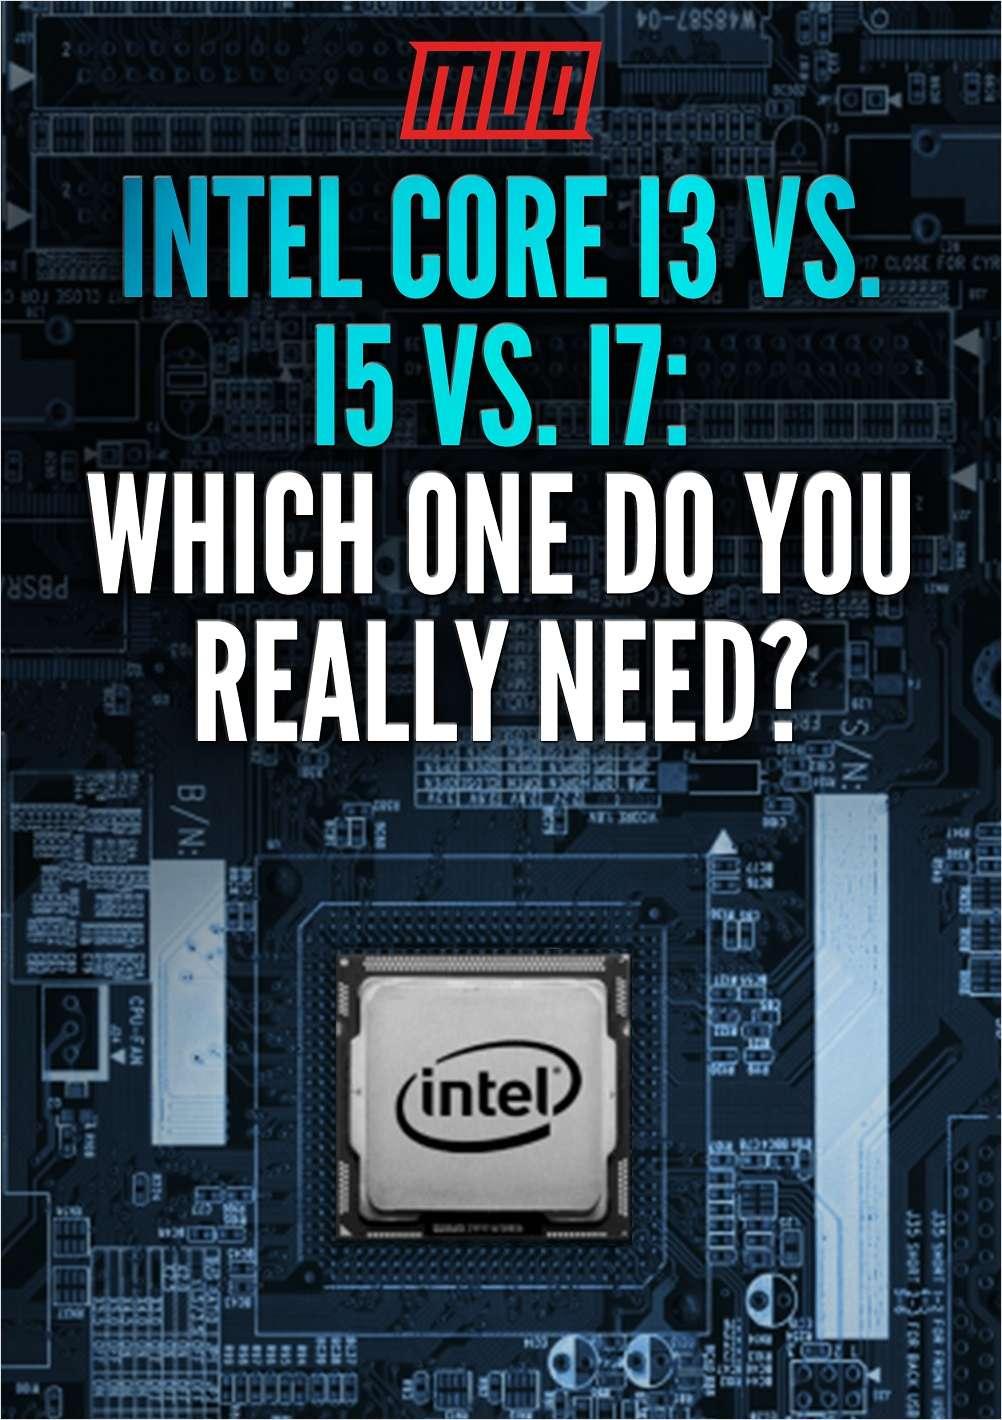 Intel Core i3 vs. i5 vs. i7: Which One Do You Really Need?